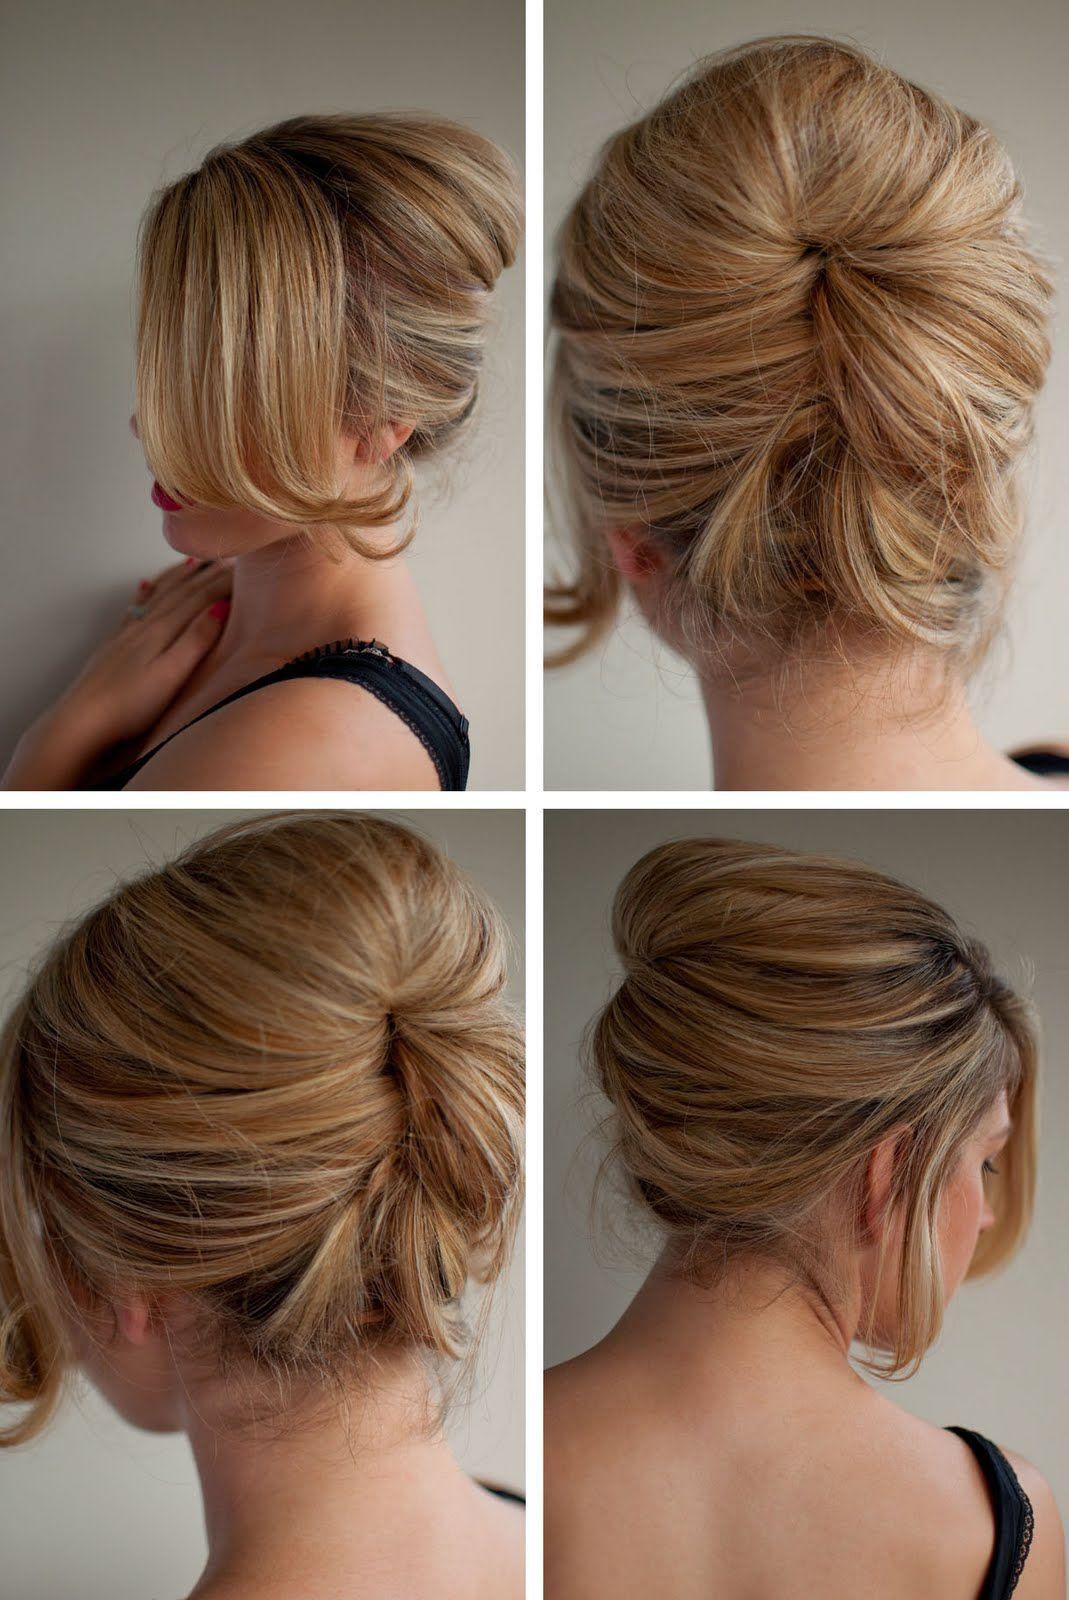 11 Days of Twist & Pin Hairstyles – Day 11 - Hair Romance  Hair